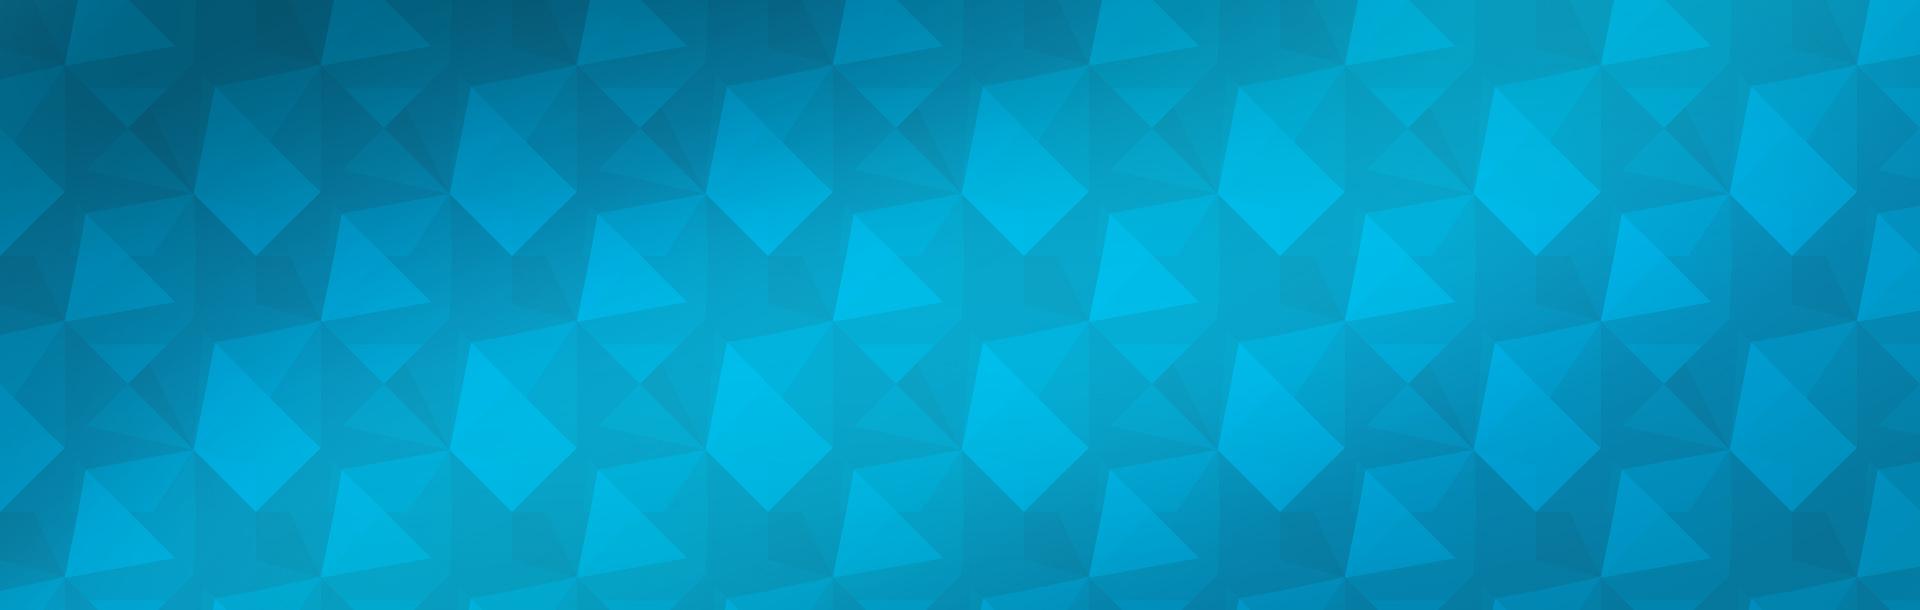 diamond-blue-background-pattern